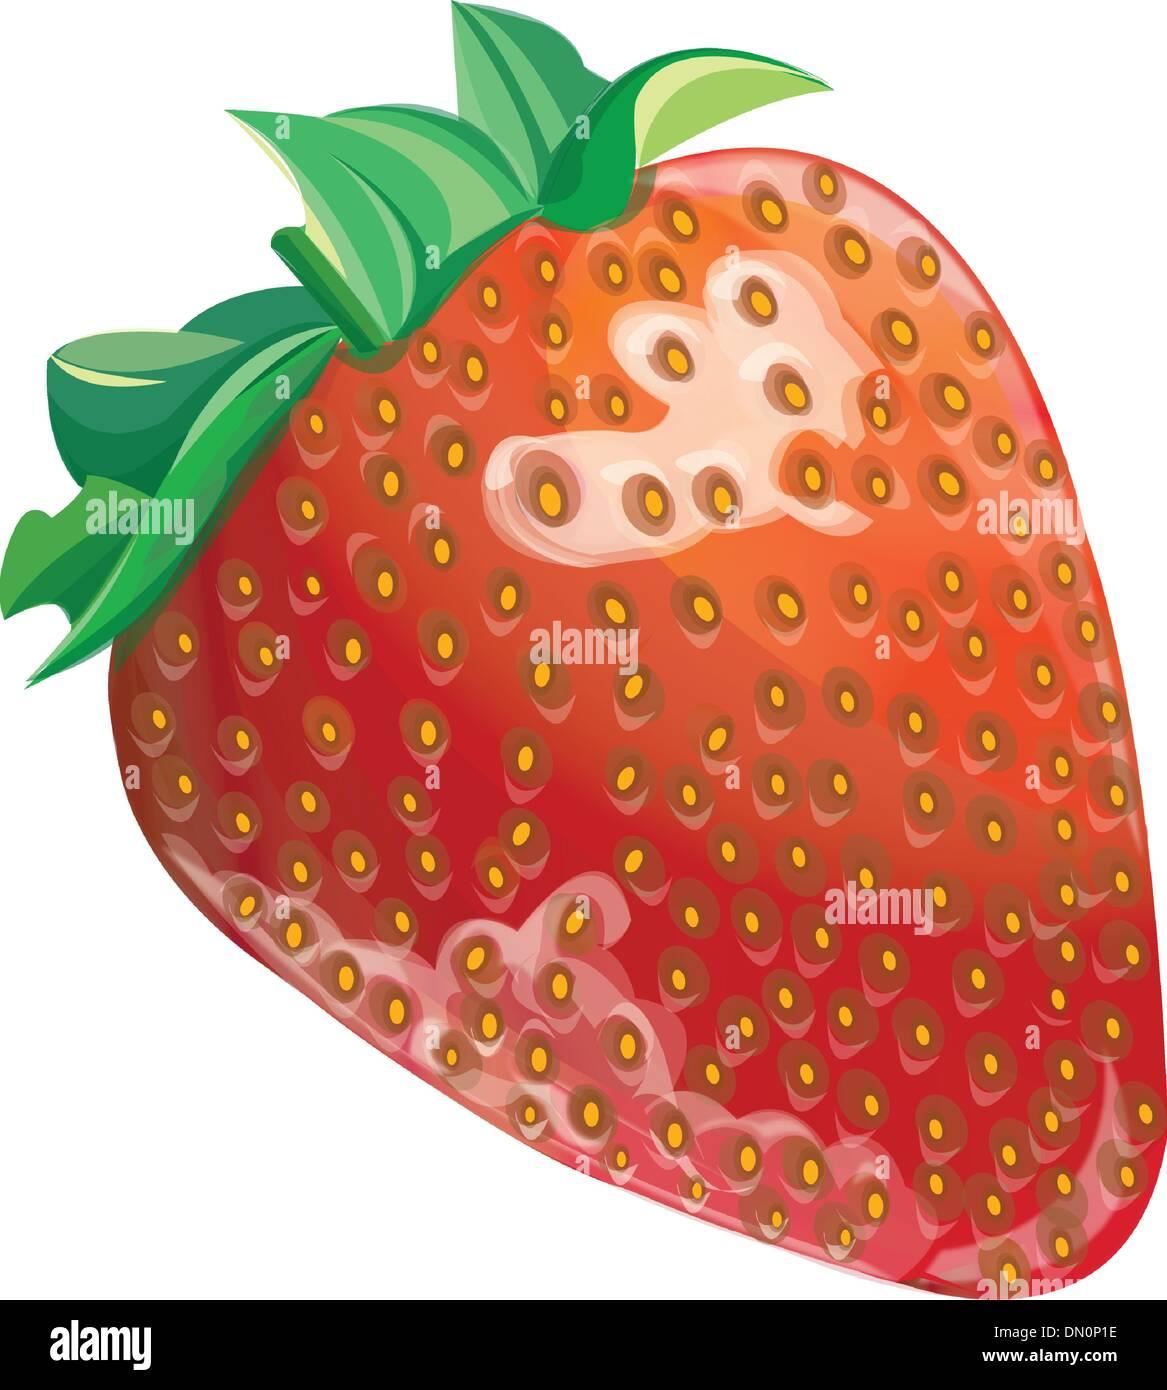 strawberry illustration - Stock Vector